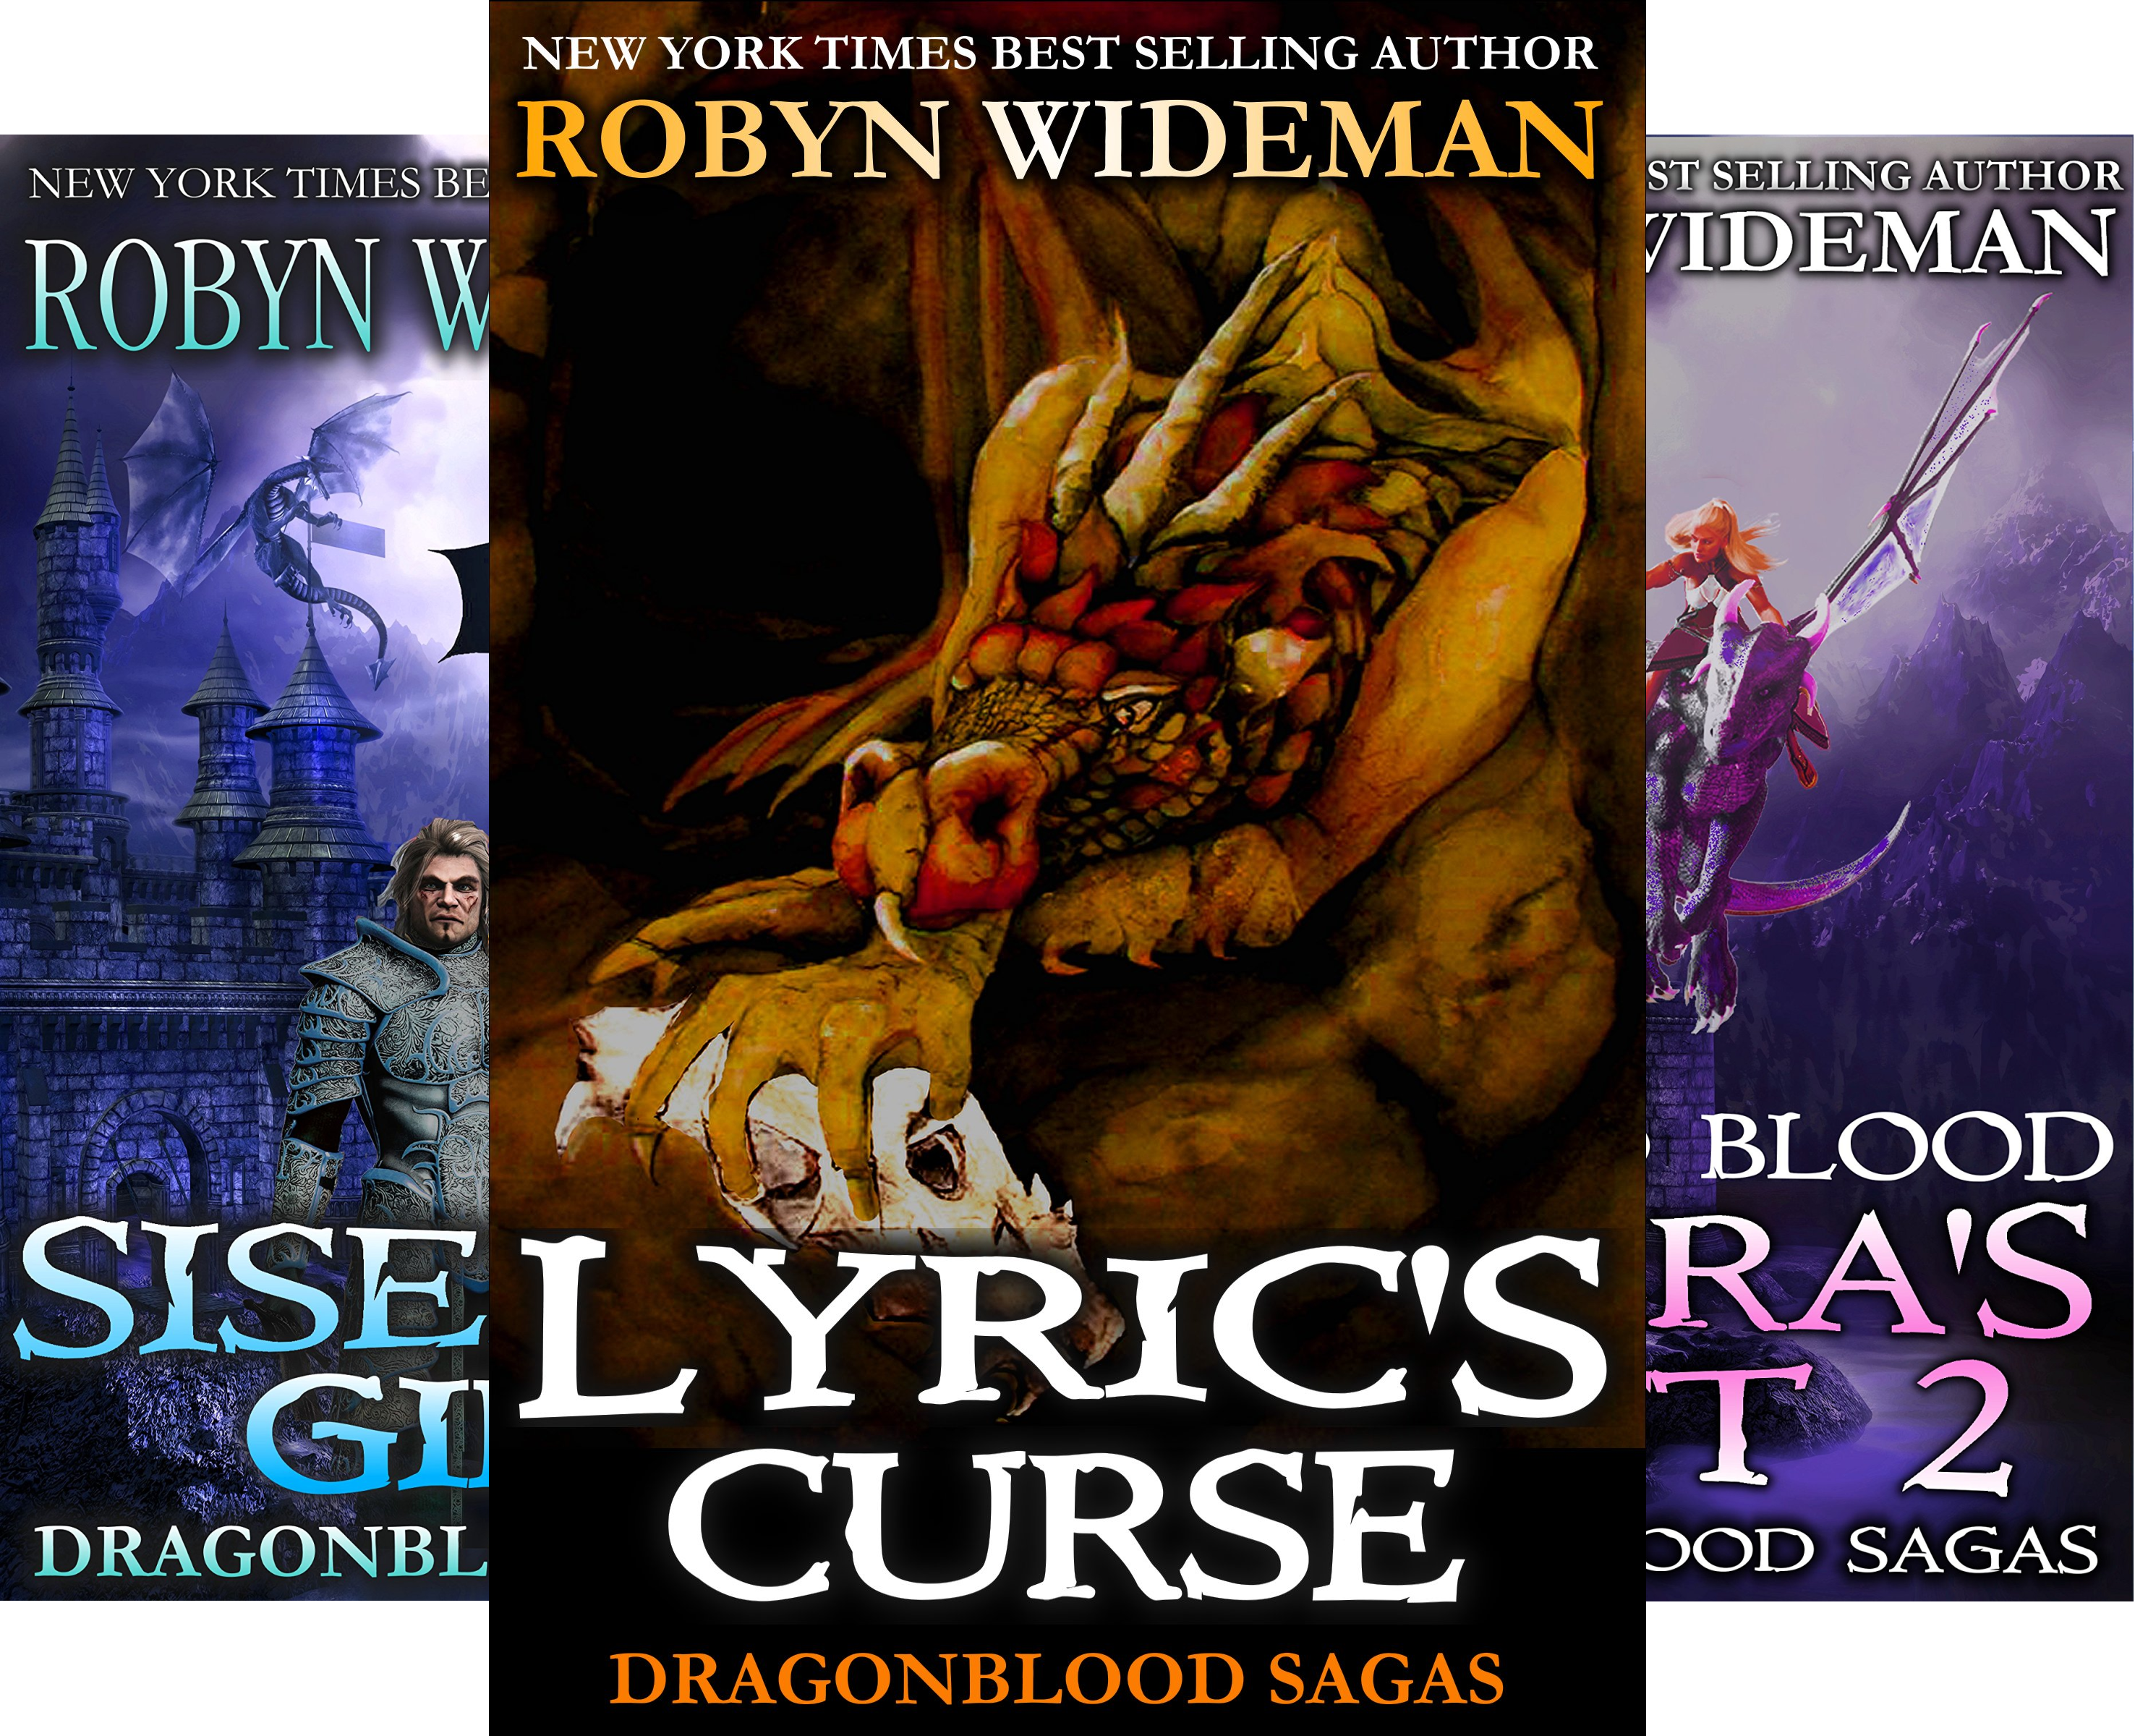 Dragonblood Sagas (4 Book Series)